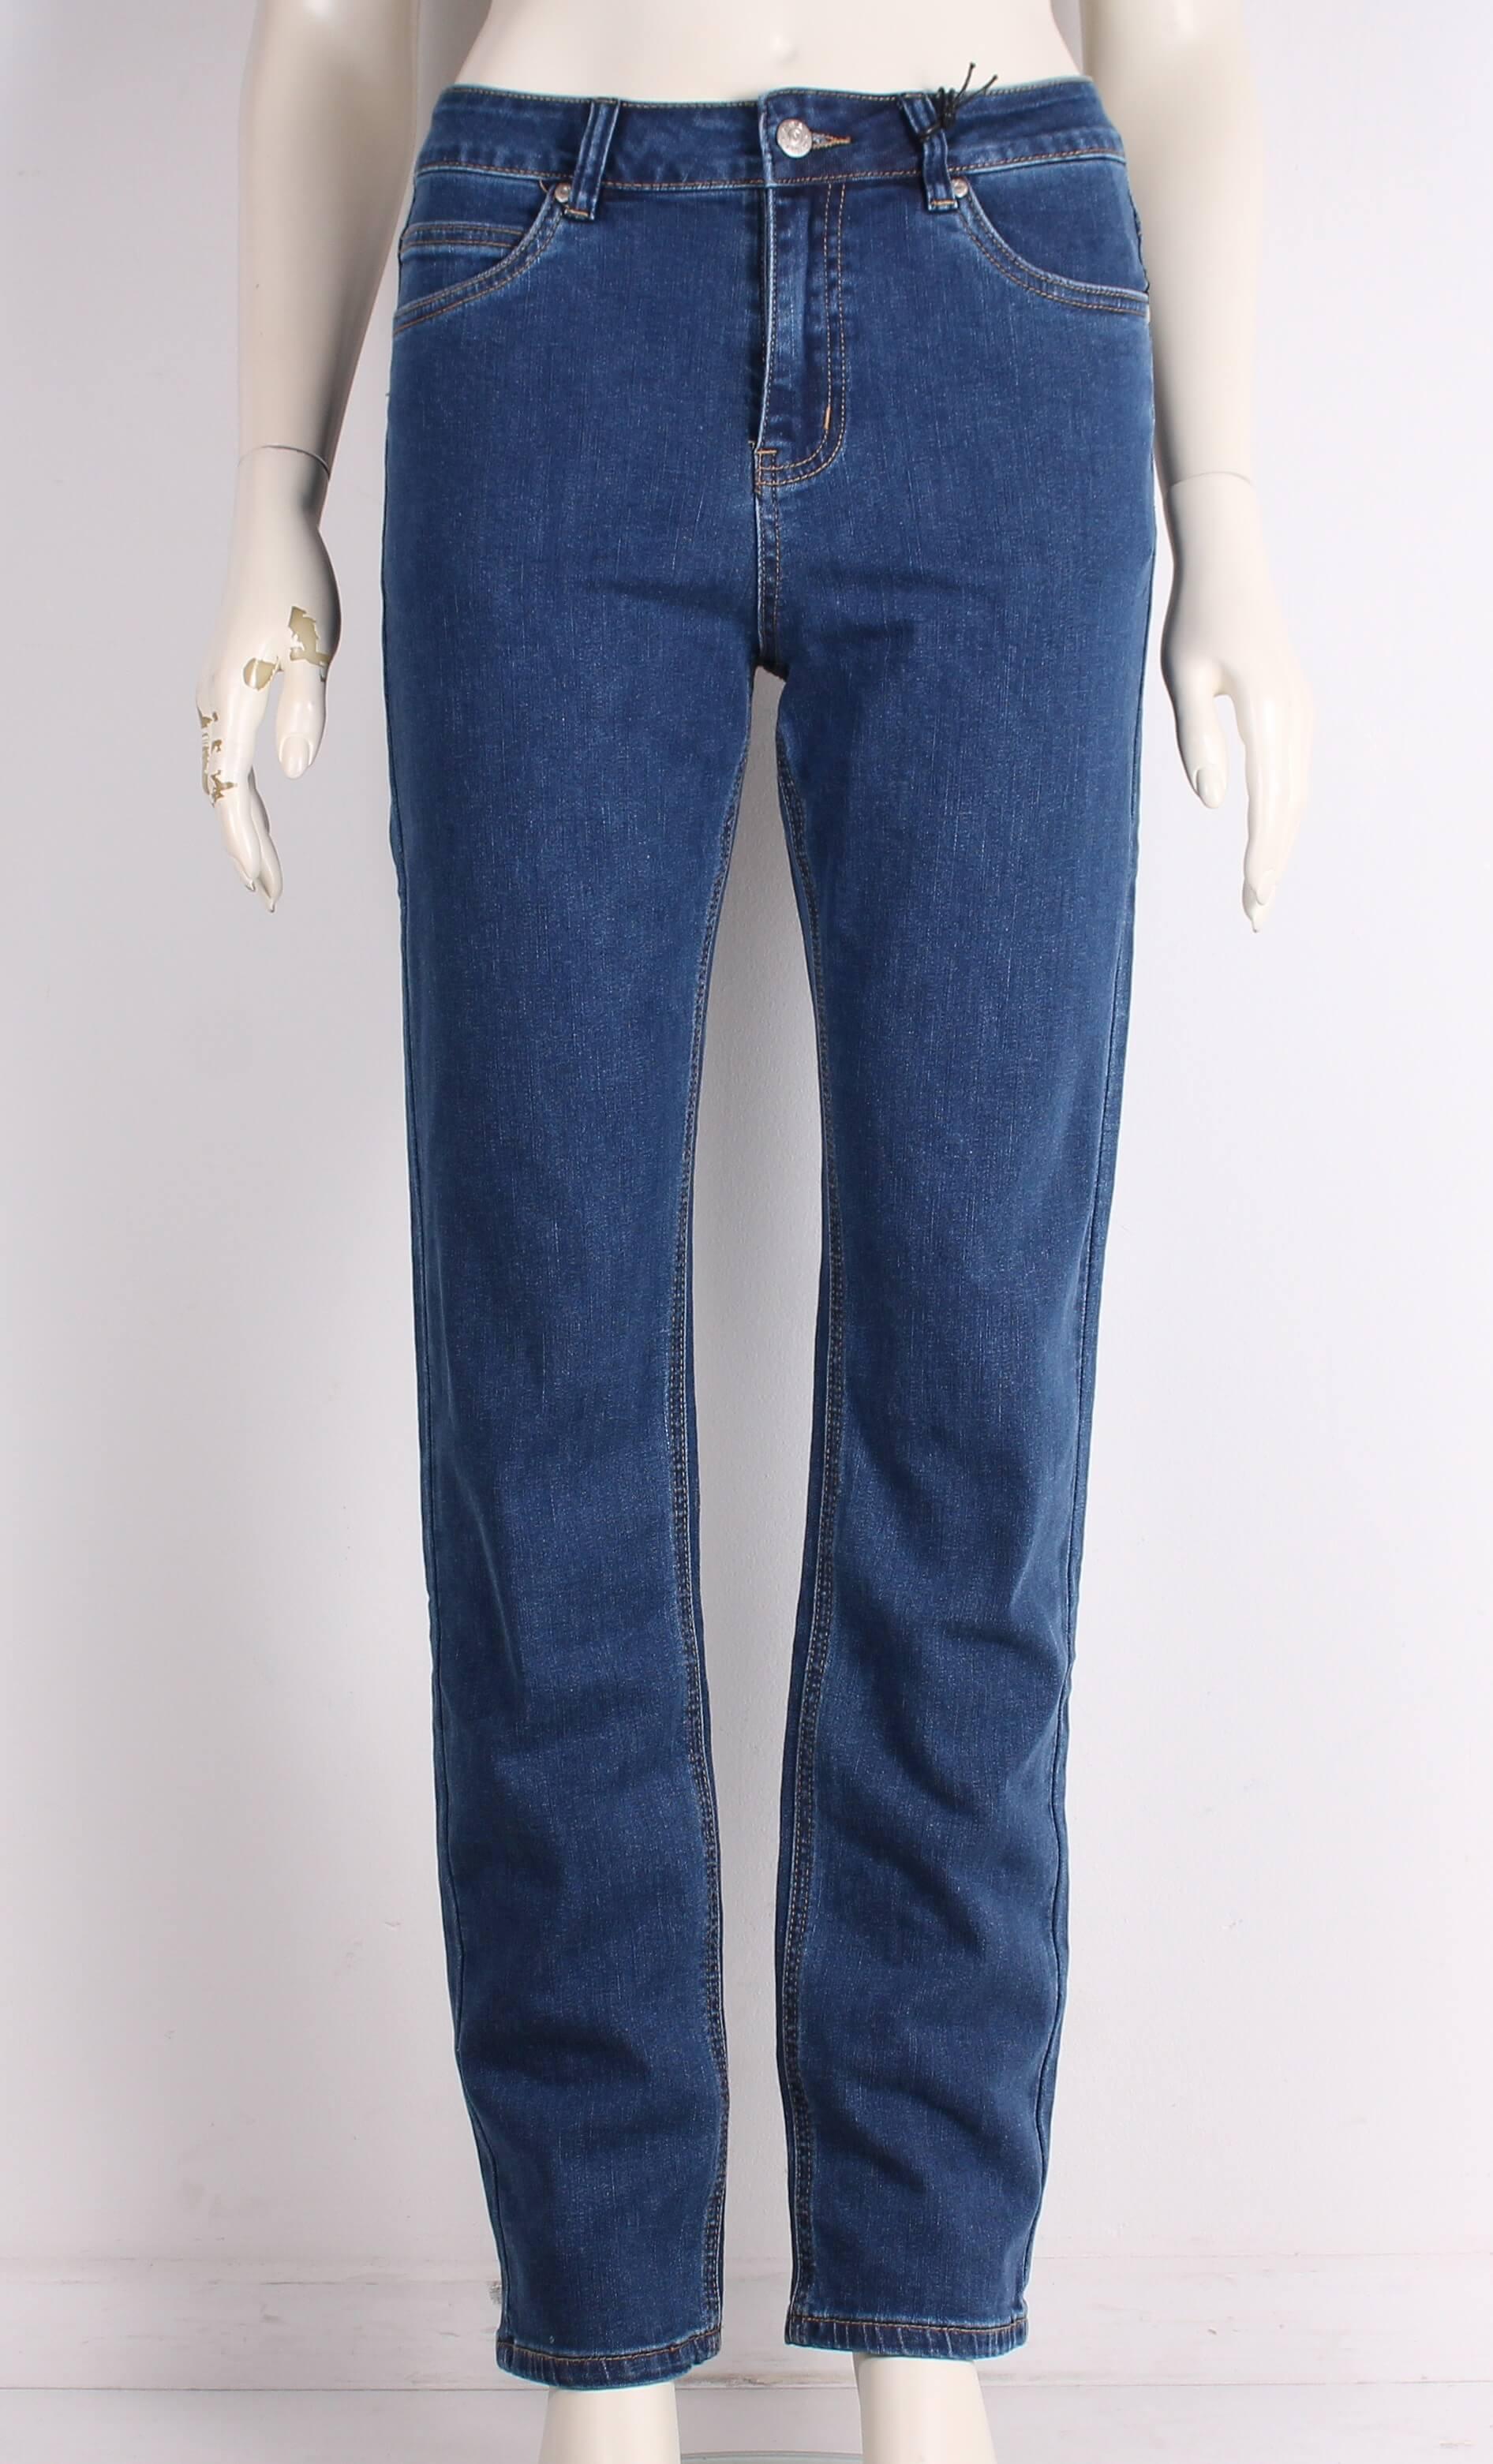 ASP – Smarte Dame Net Jeans m. høj talje – Blå